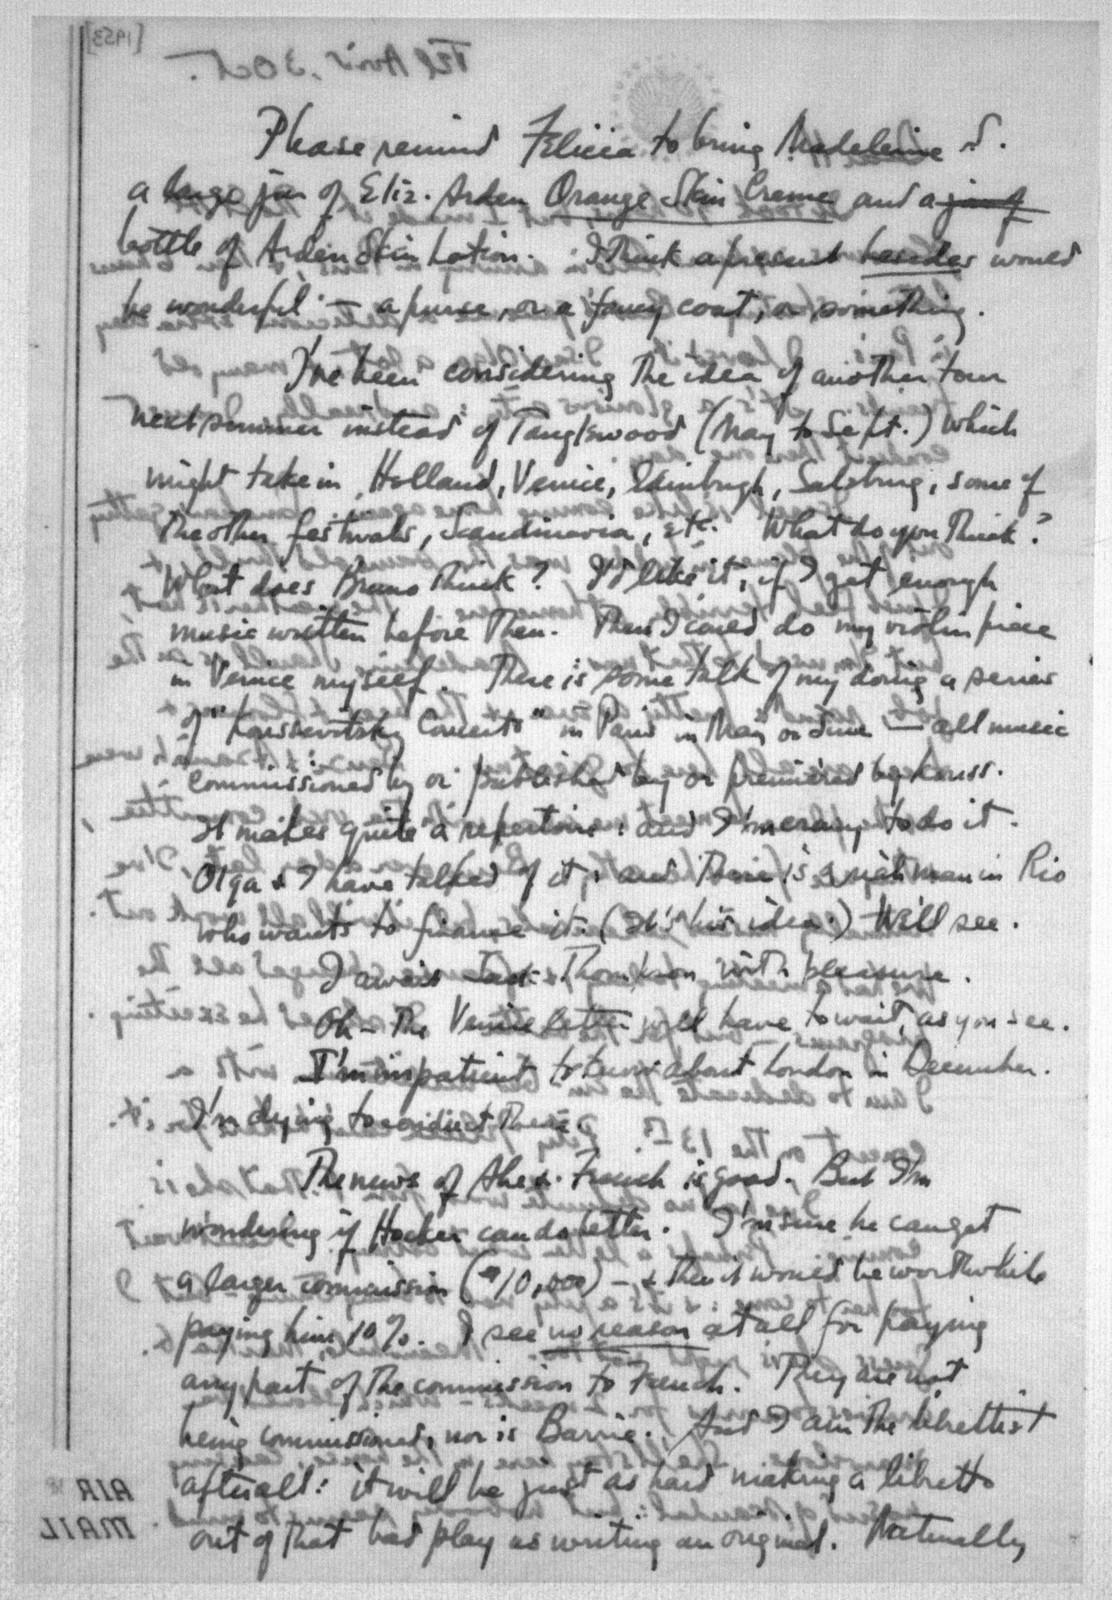 Letter from Leonard Bernstein to Helen Coates, October 3, 1953